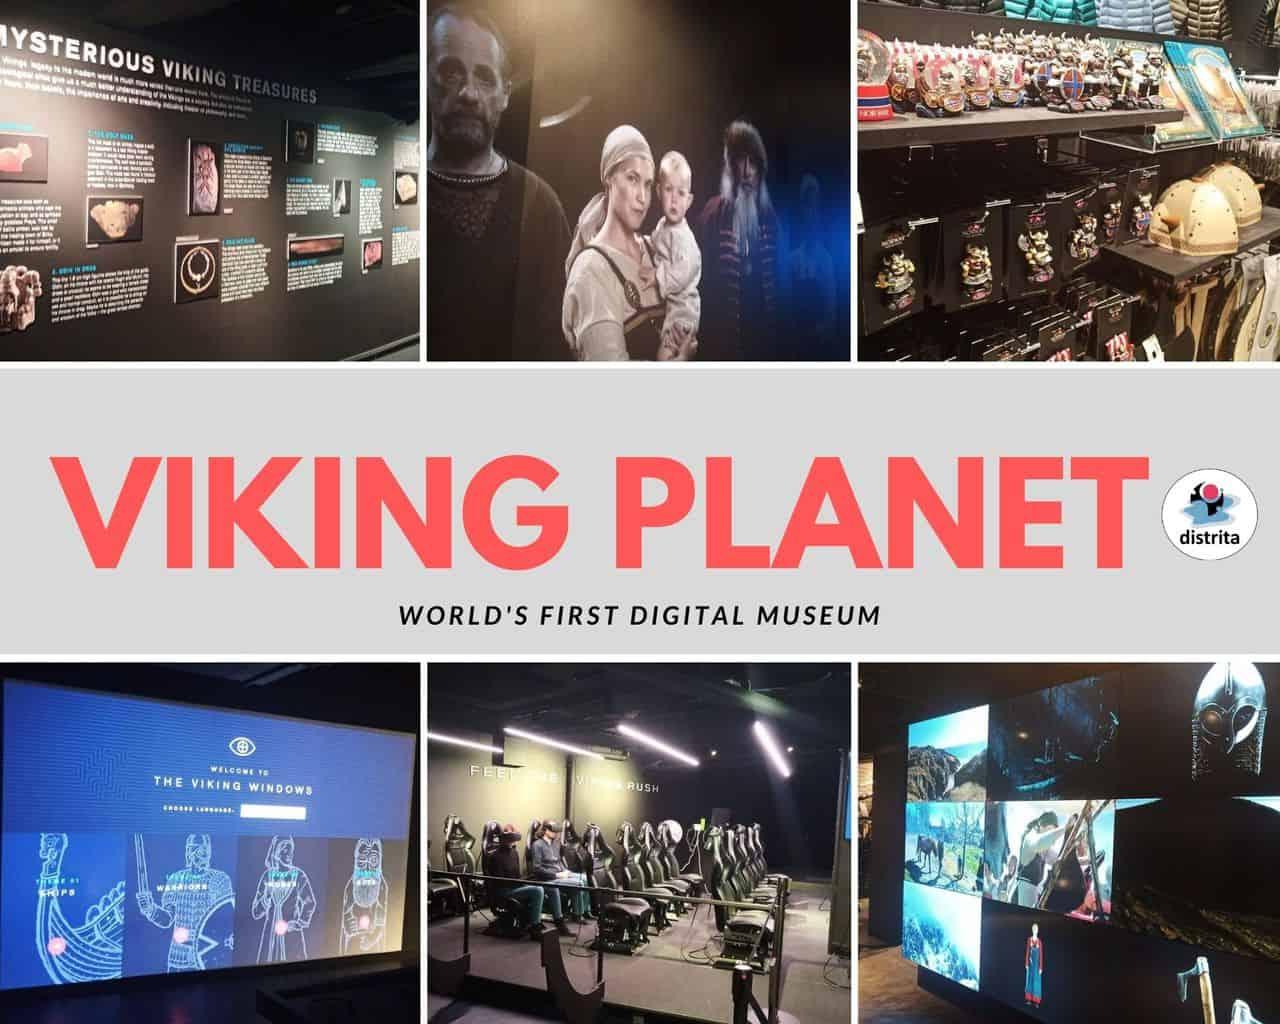 Visit The Viking Planet – world's first digital viking museum